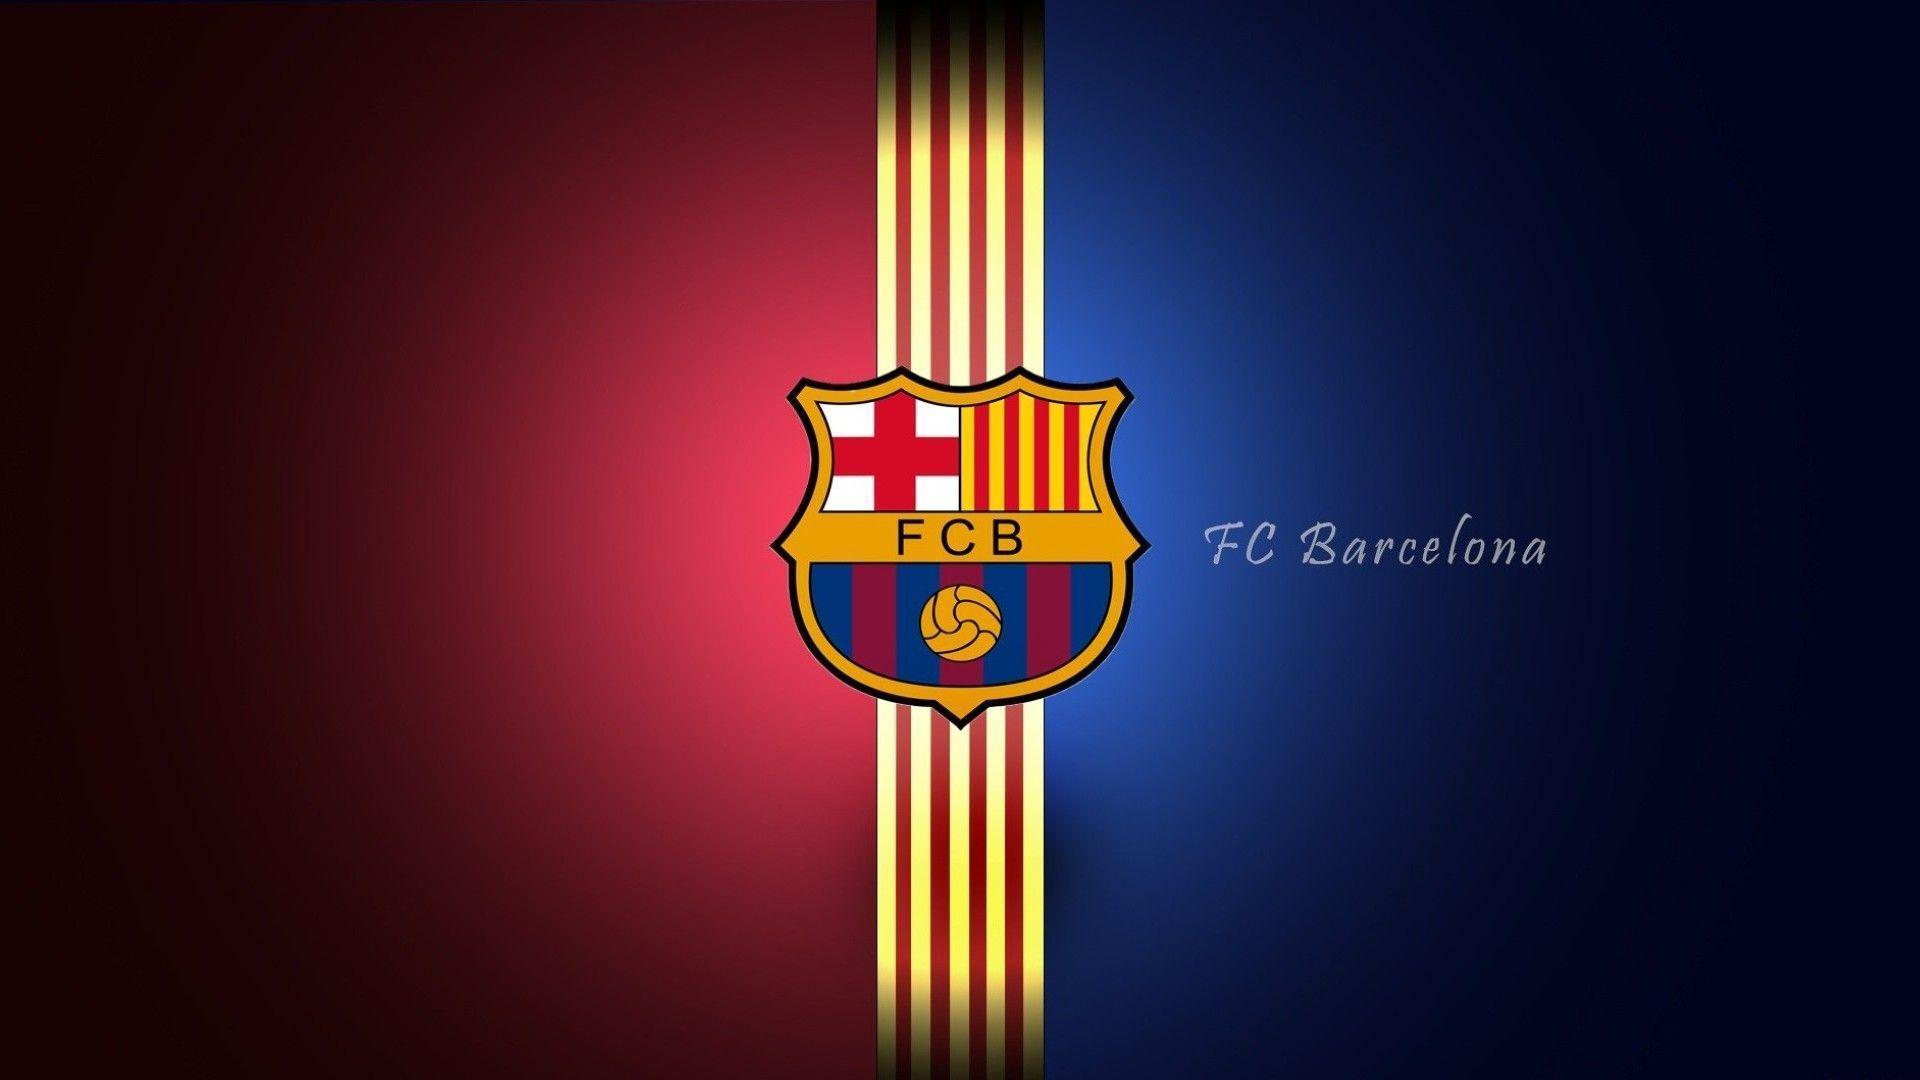 FC Barcelona Wallpapers HD Download